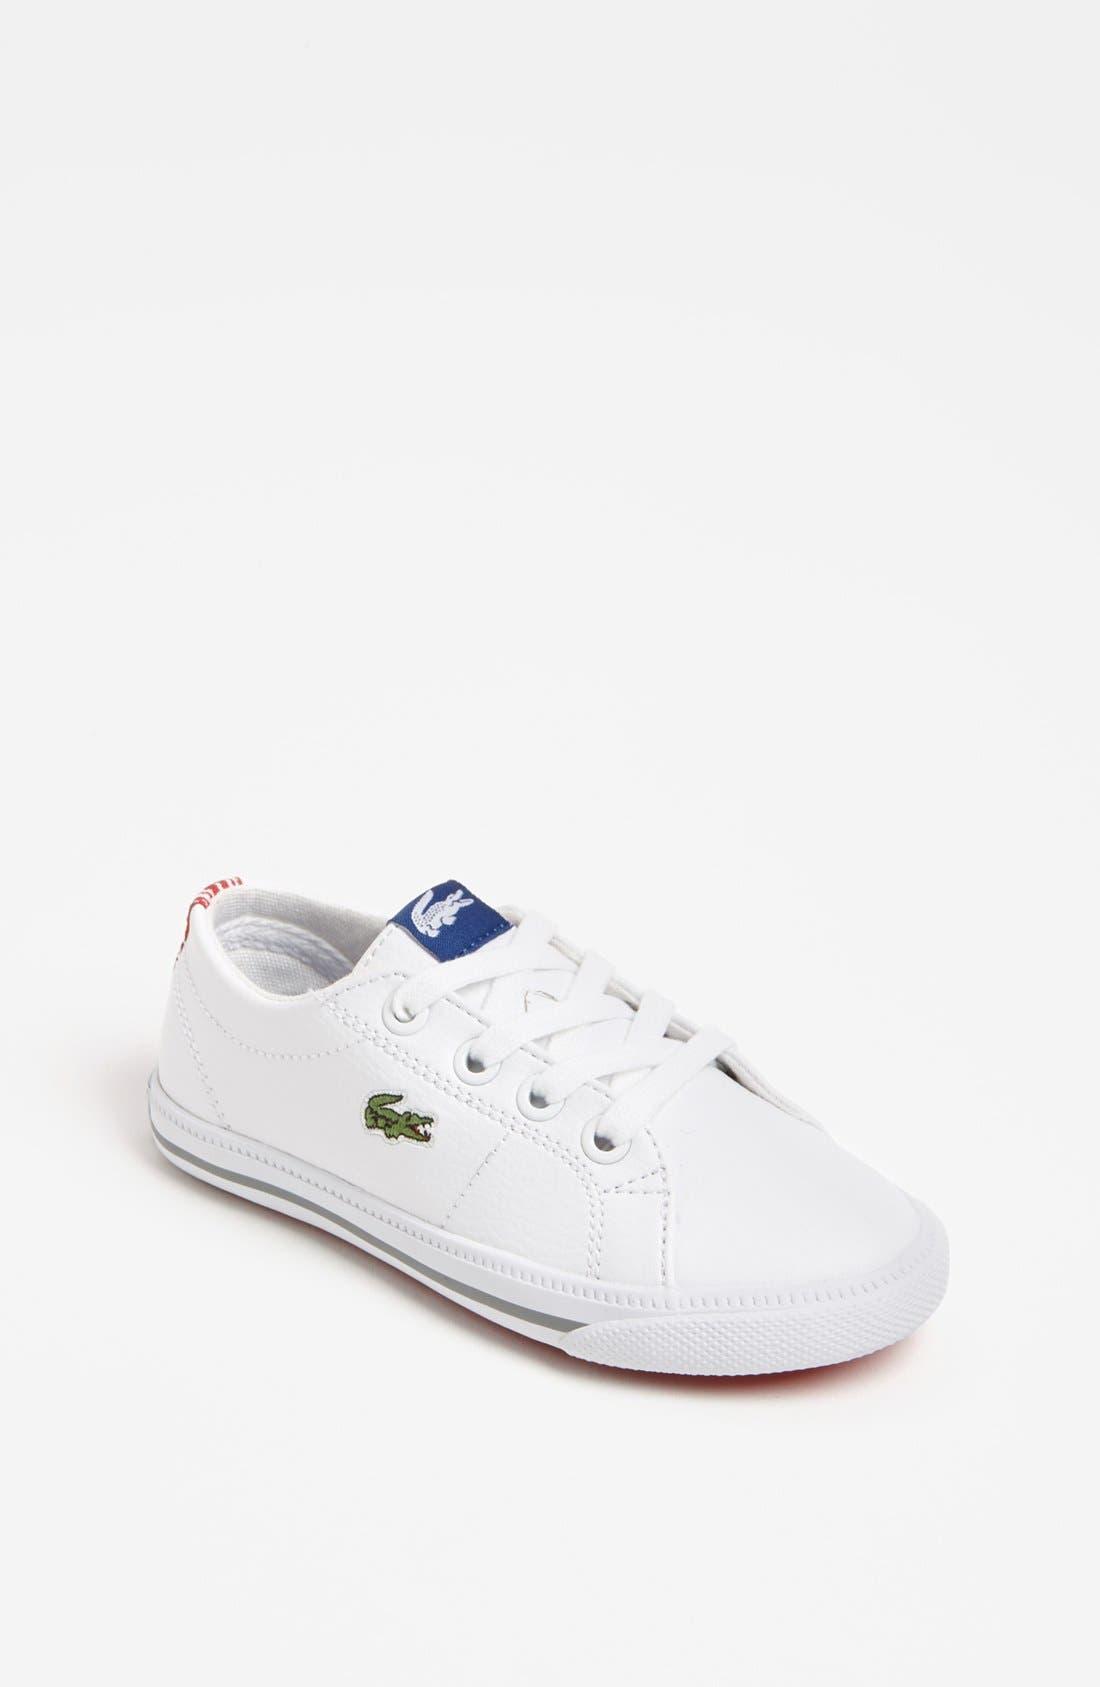 Main Image - Lacoste 'Marcel' Sneaker (Toddler)